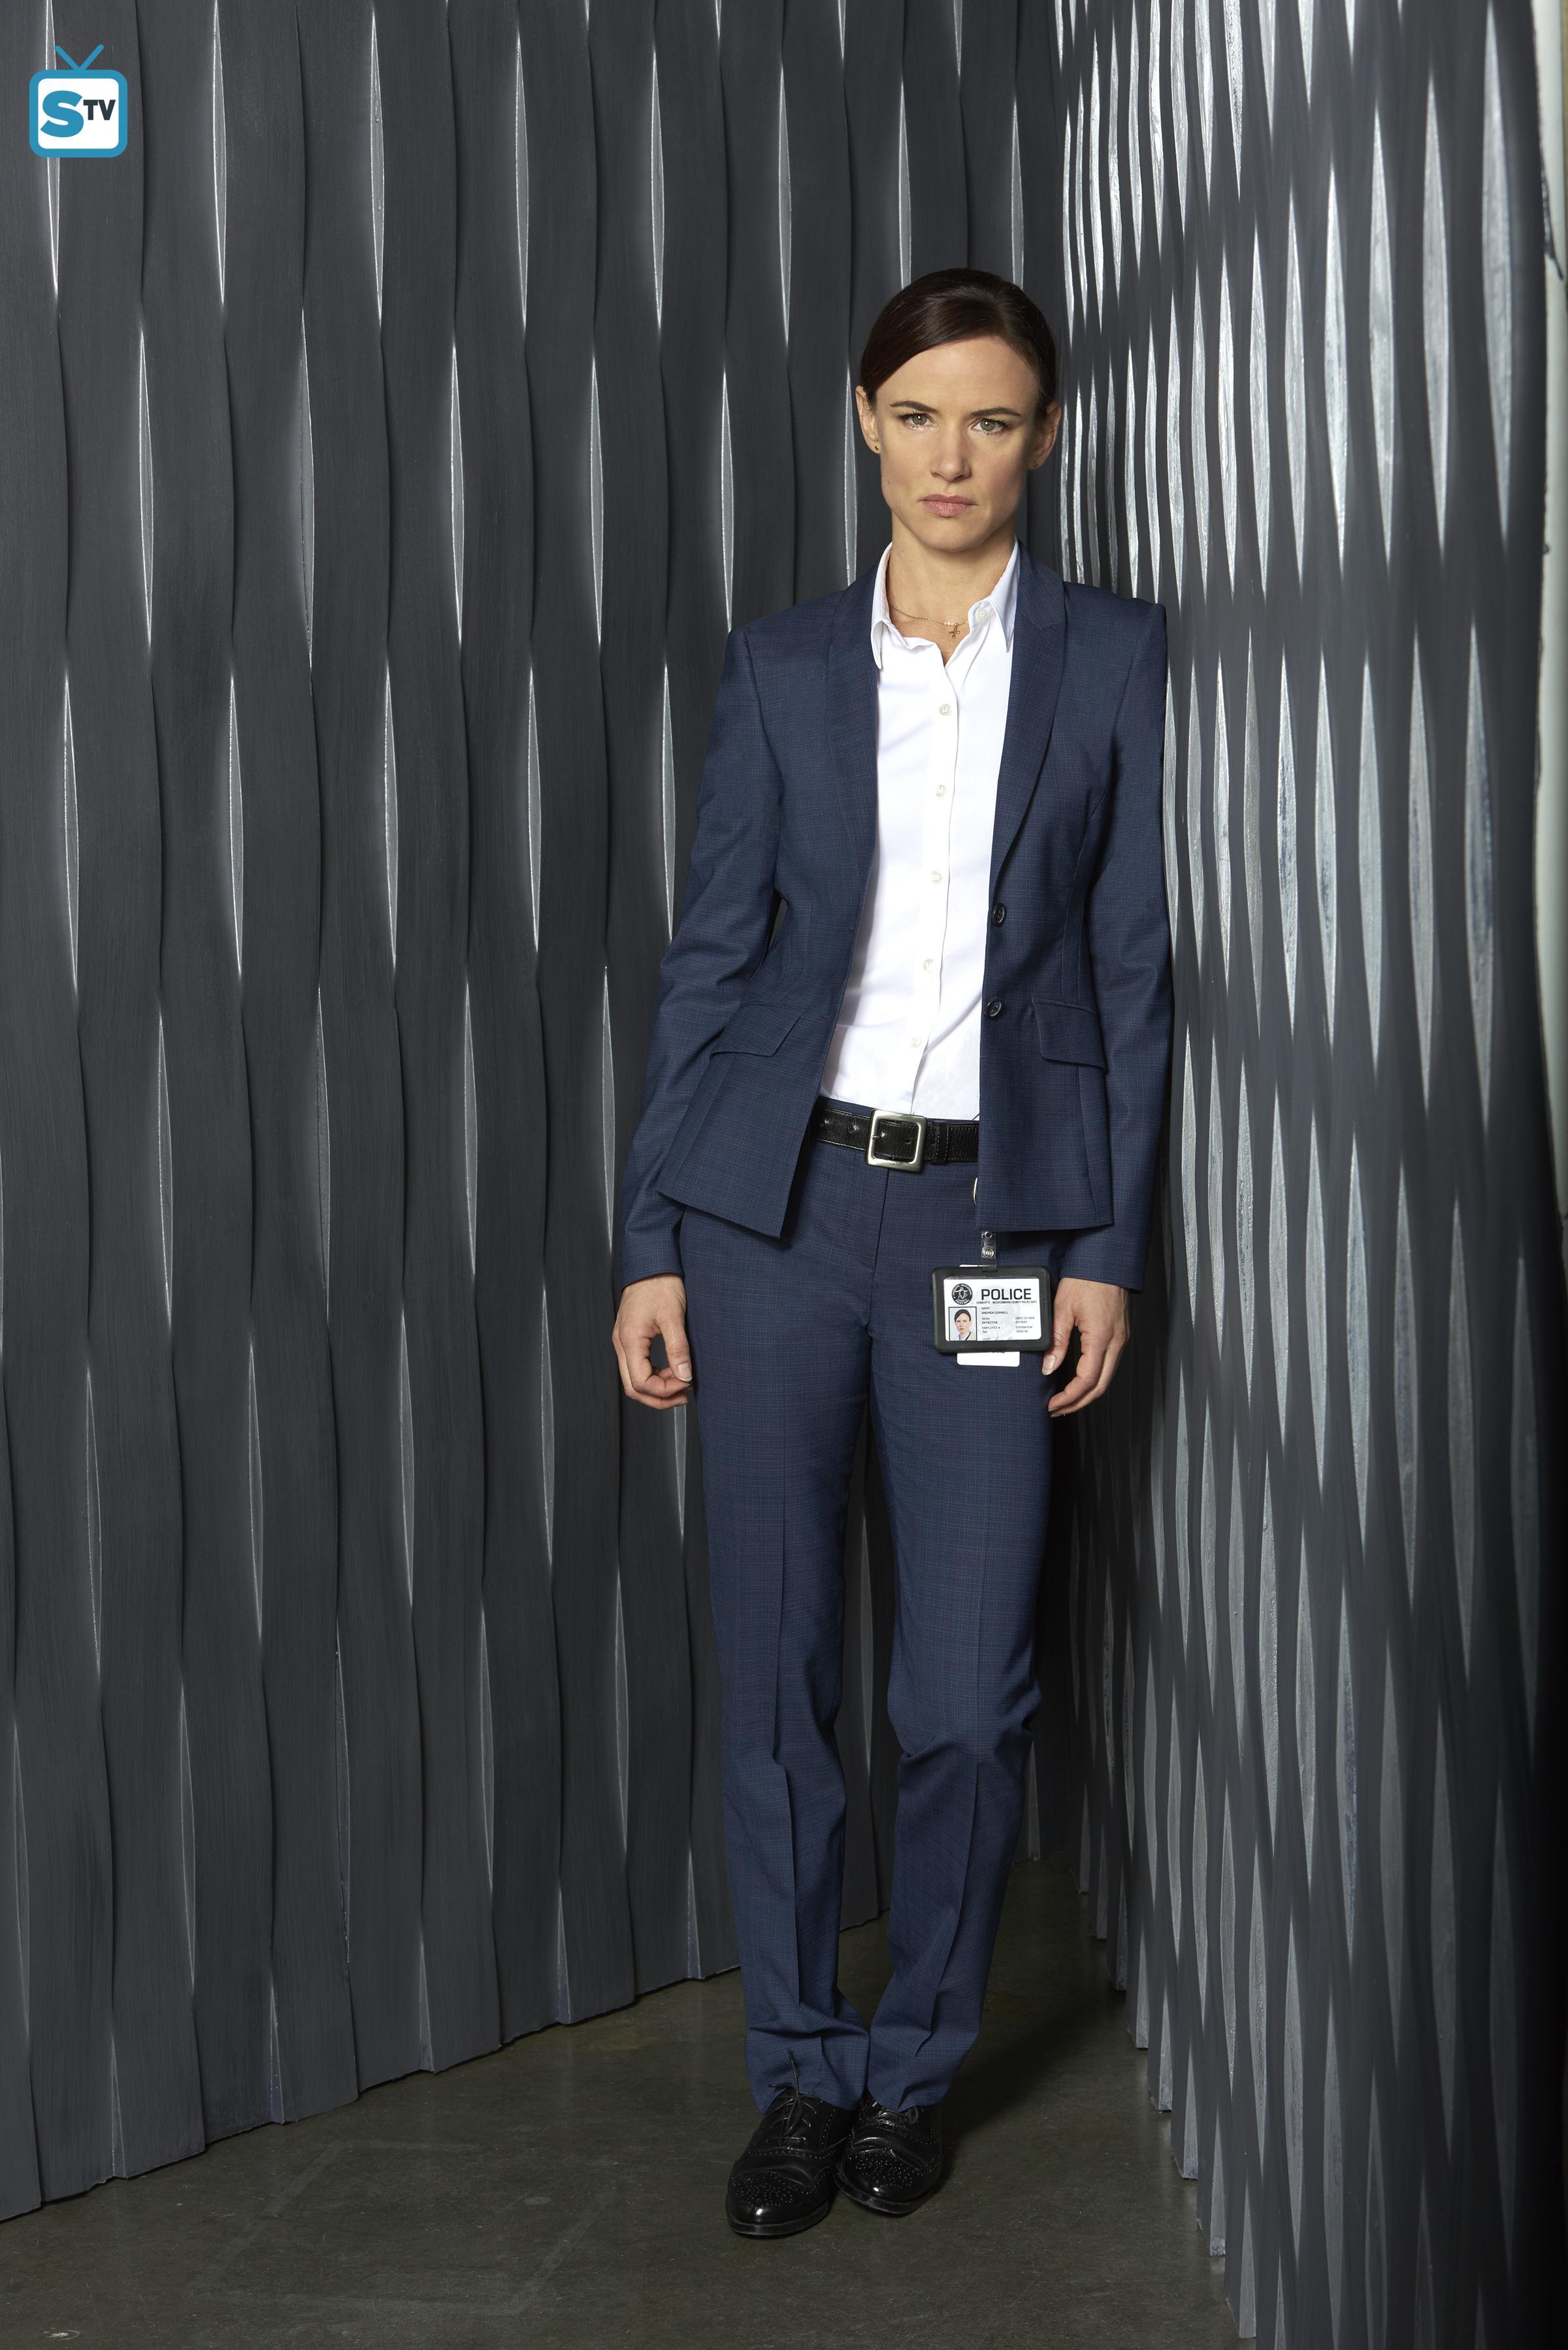 Juliette Lewis images Juliette Lewis as Detective Andrea Cornell in ...